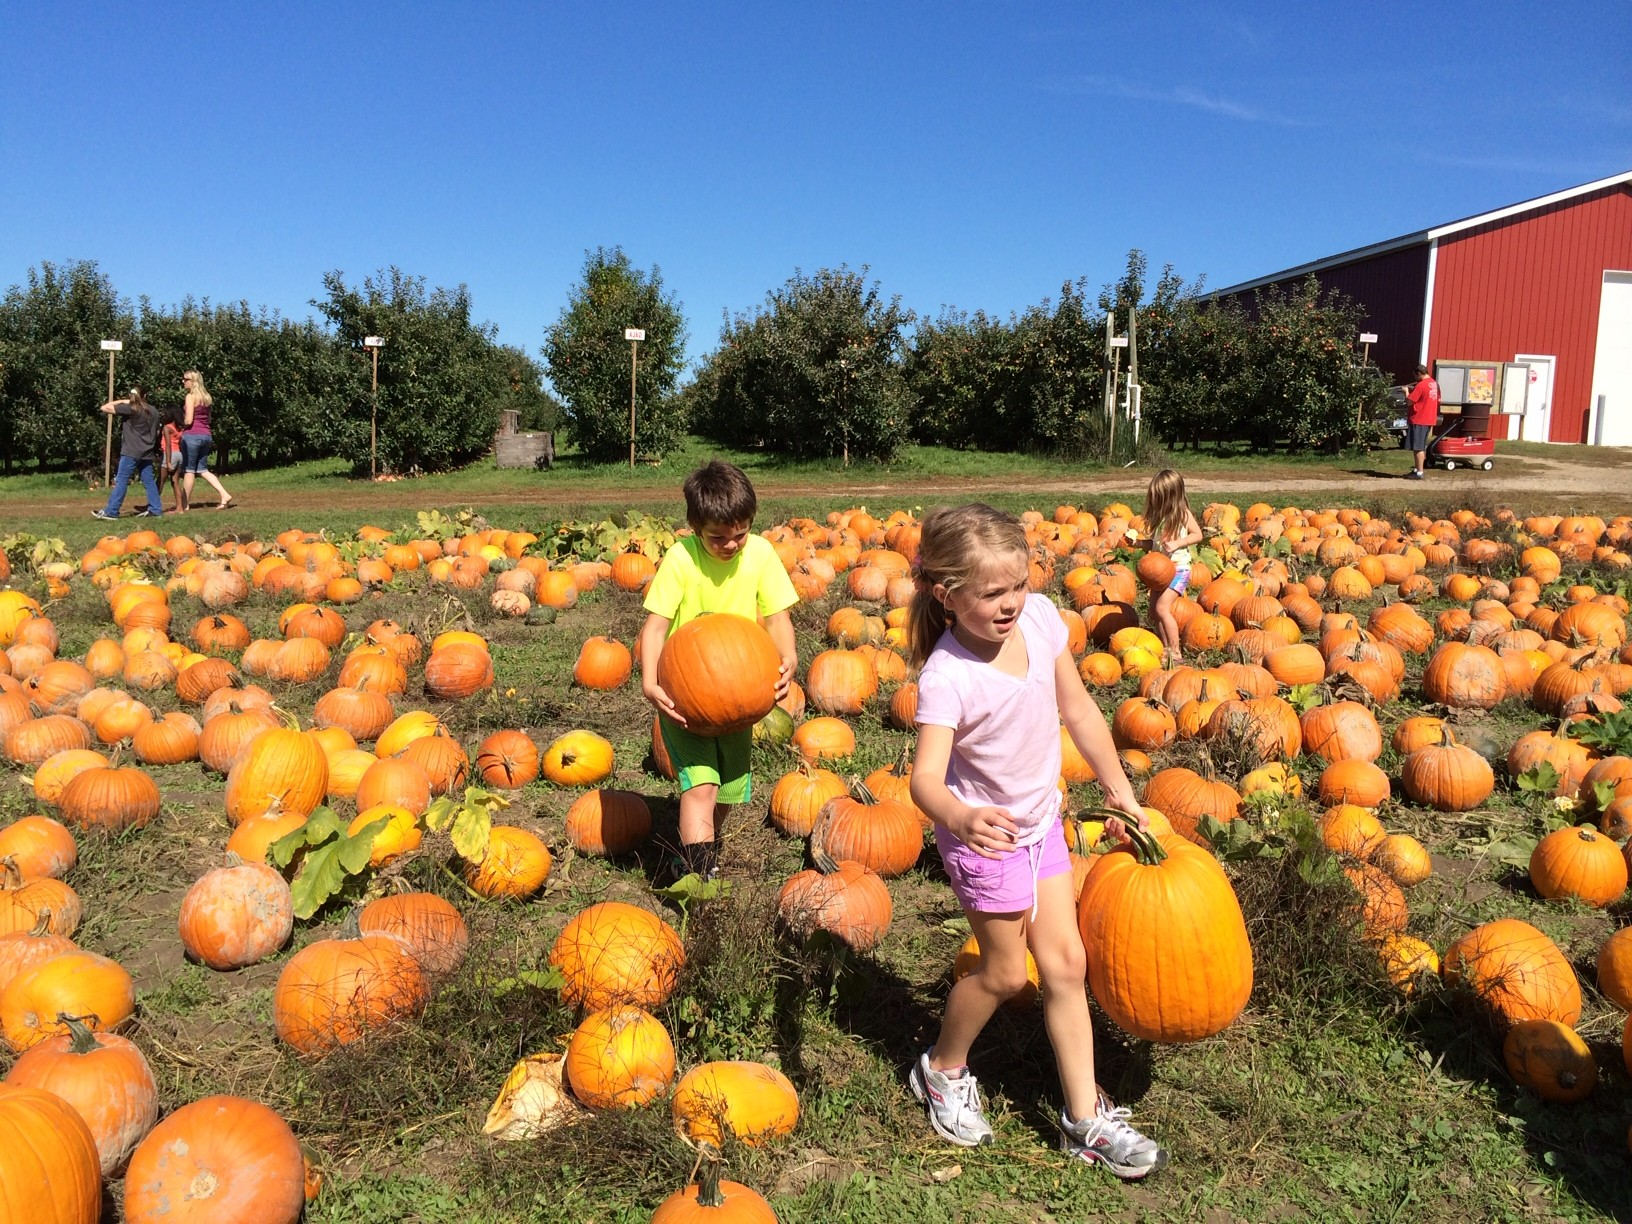 Kids Picking Pumpkins In Grand Rapids Michigan